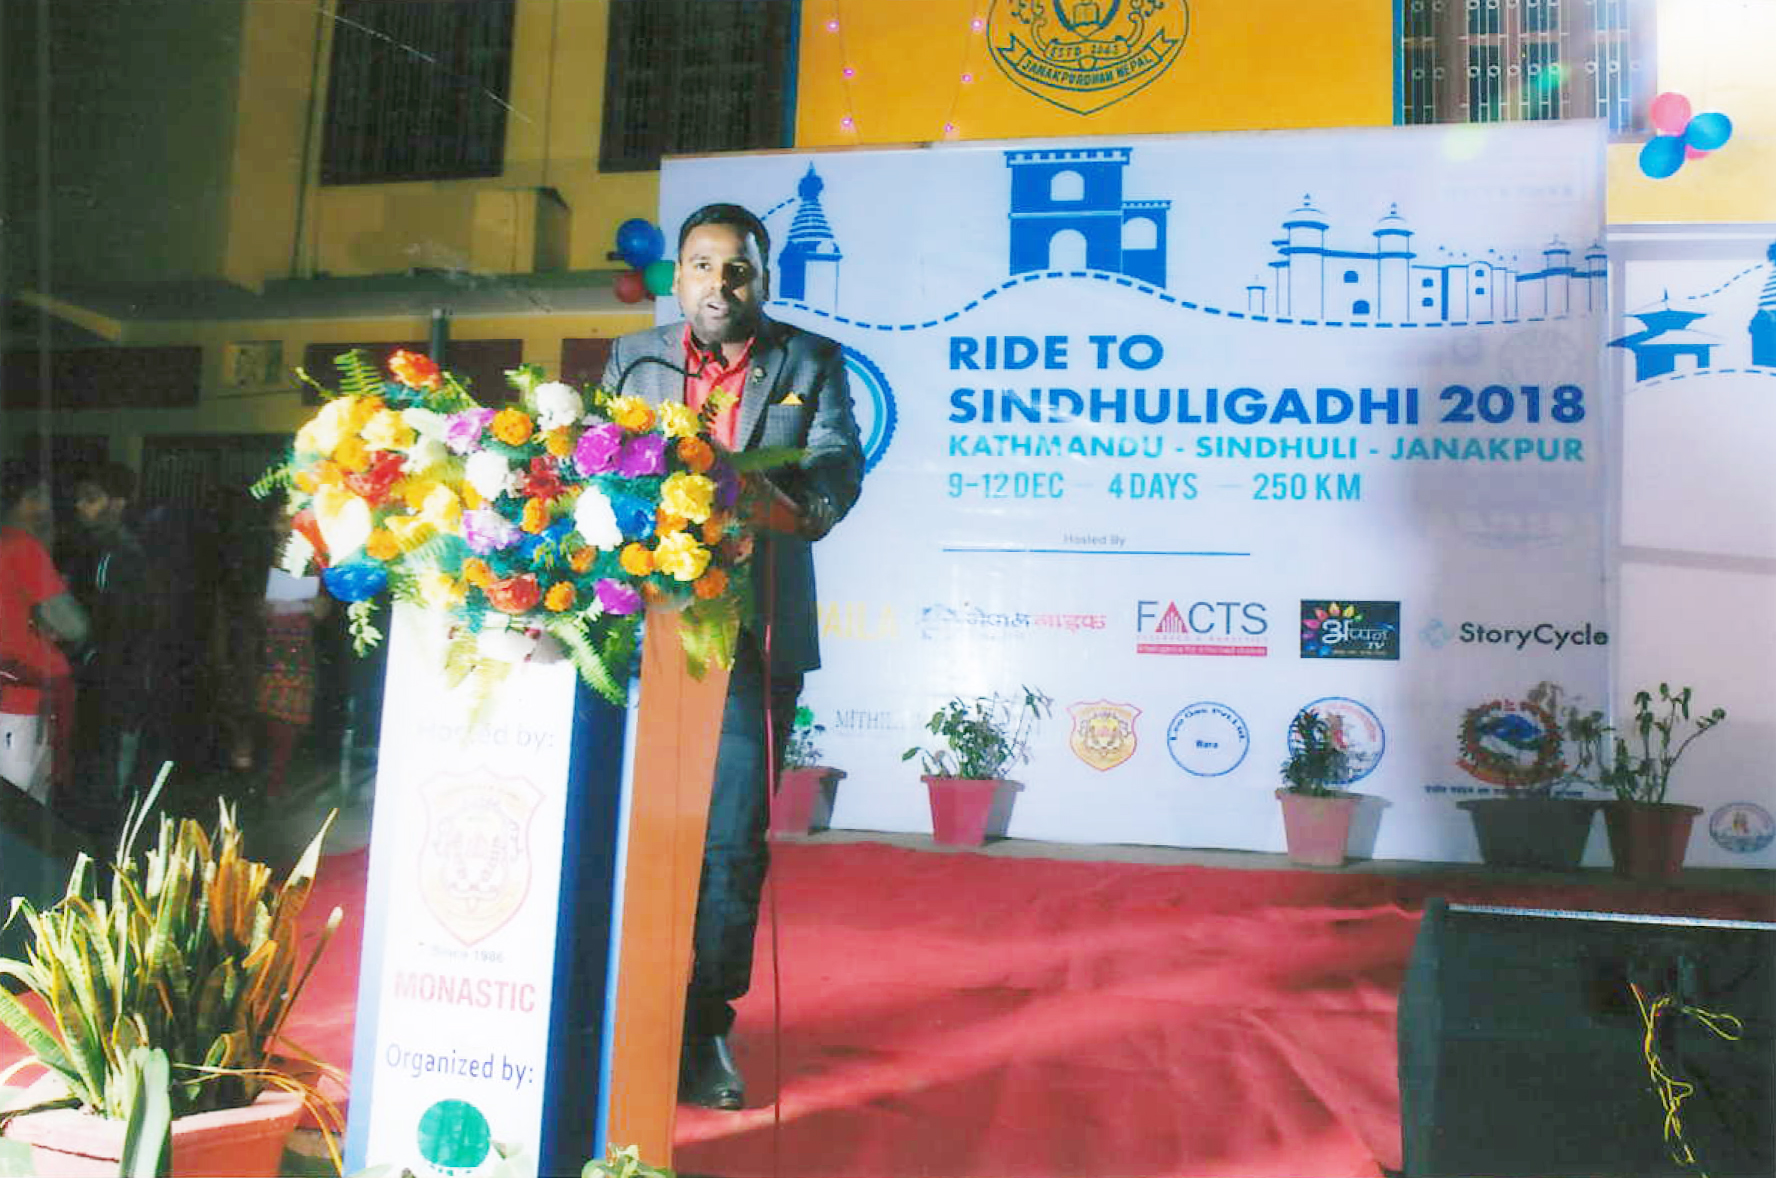 Sano Paila – Ride to Sindhuligadhi